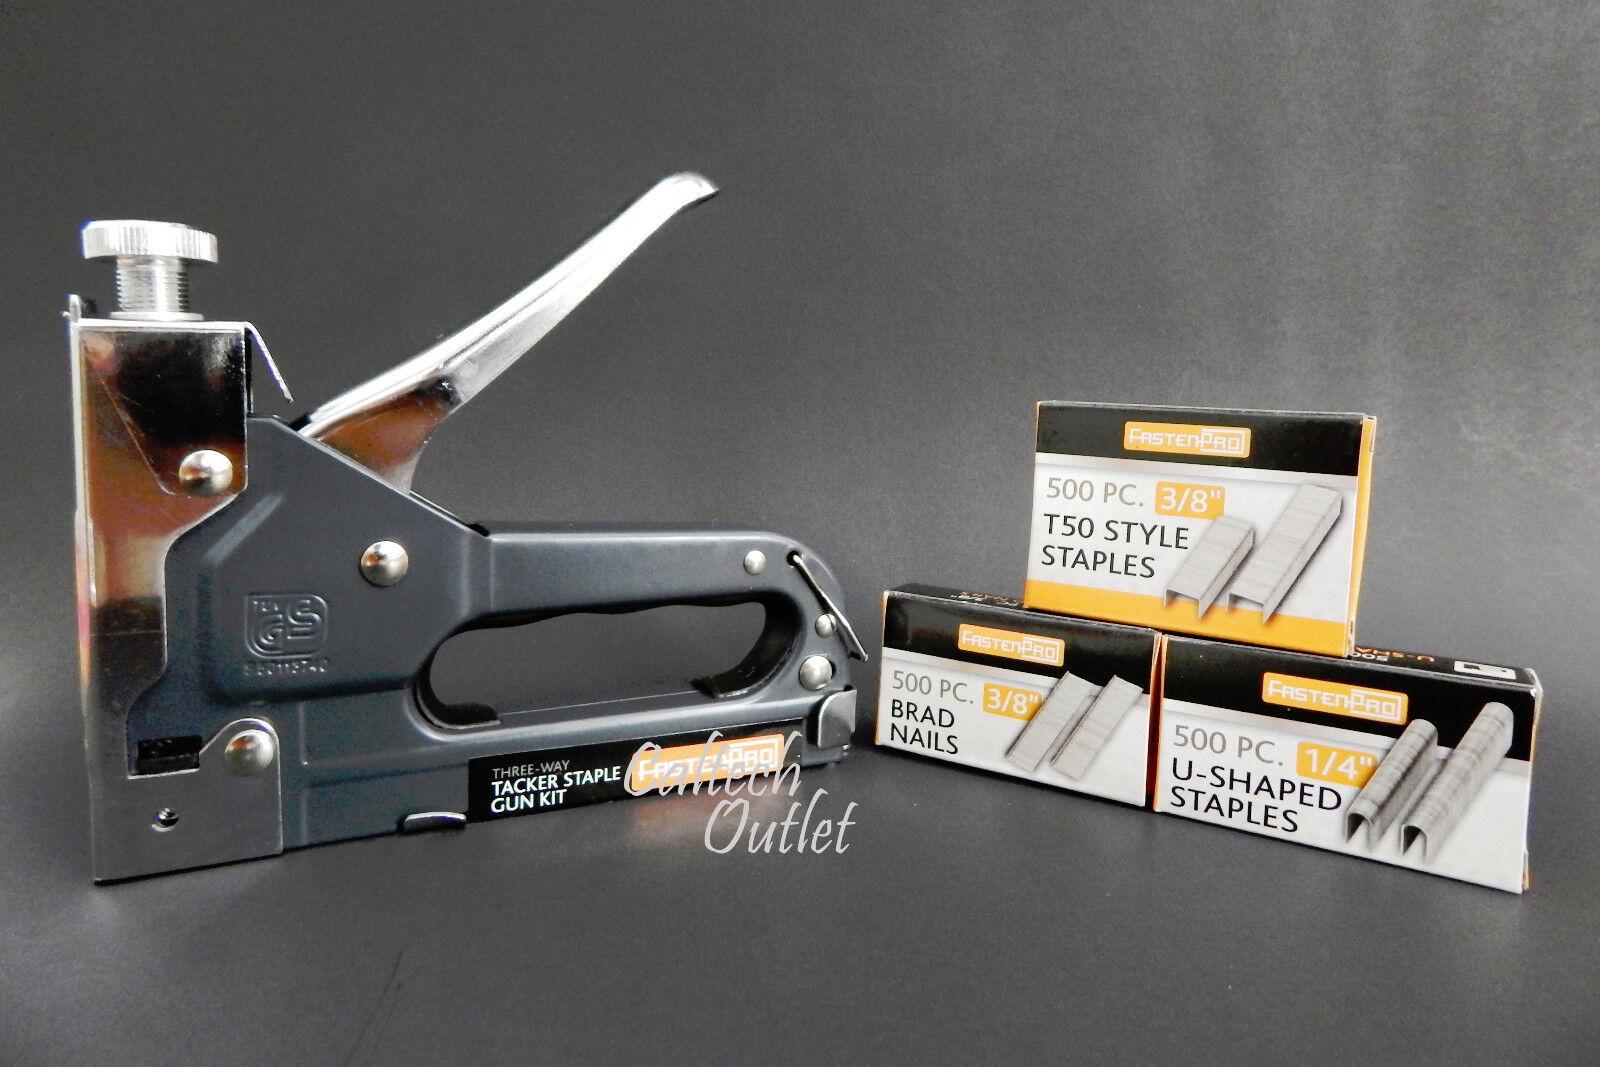 Powerful 3 Way Tacker Staple Gun Stapler Kit w/1500 Staples